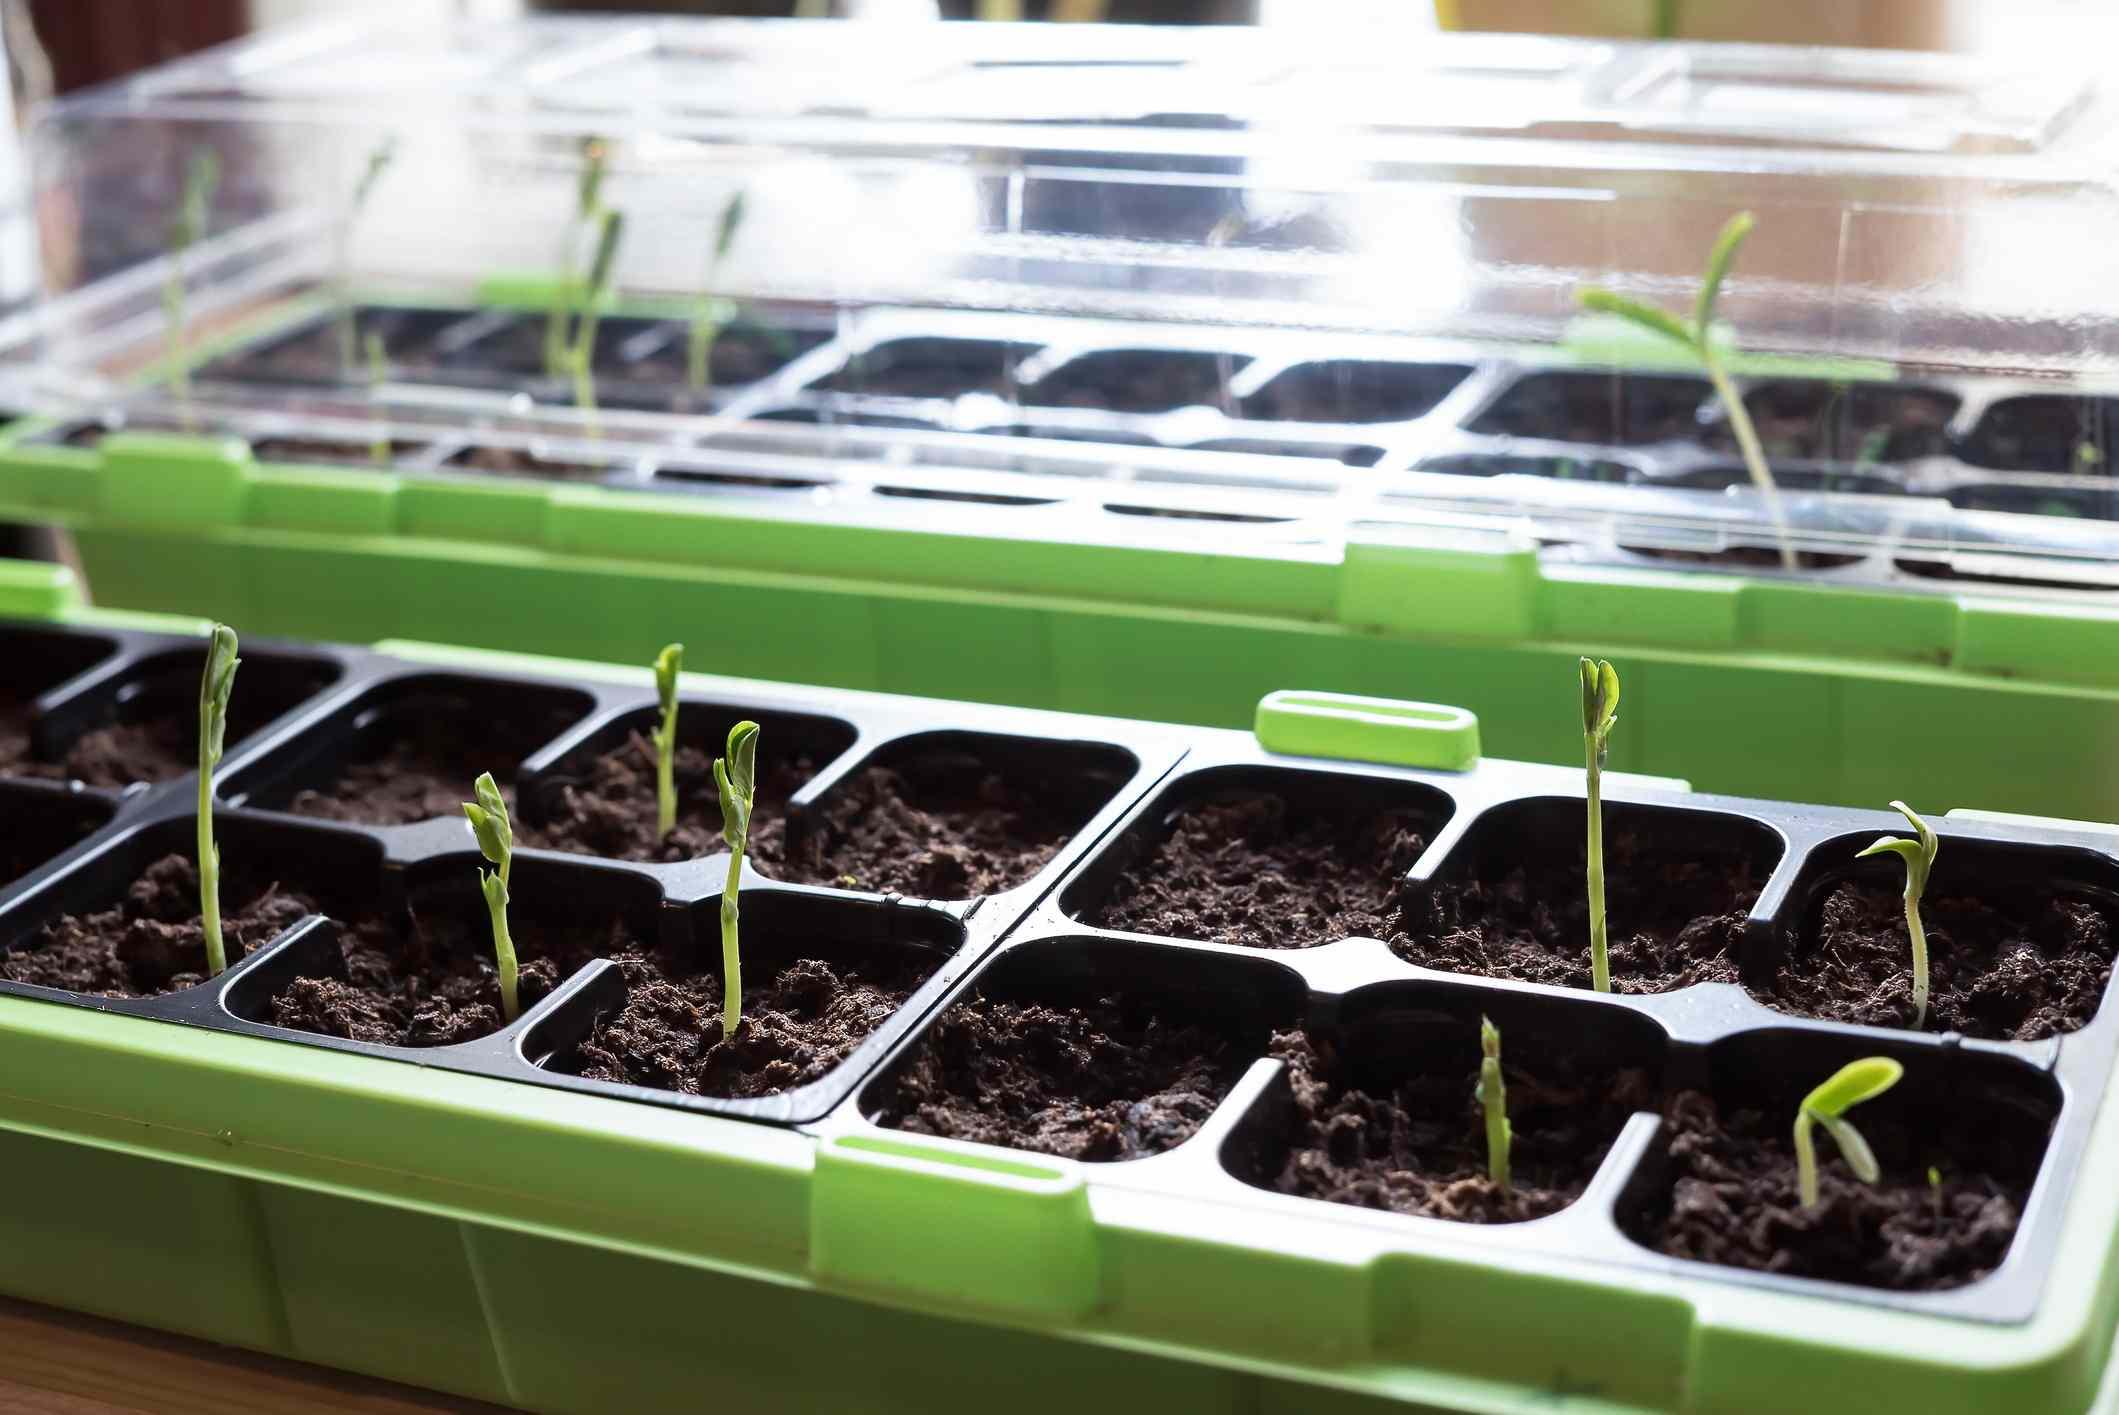 seedling tray materials